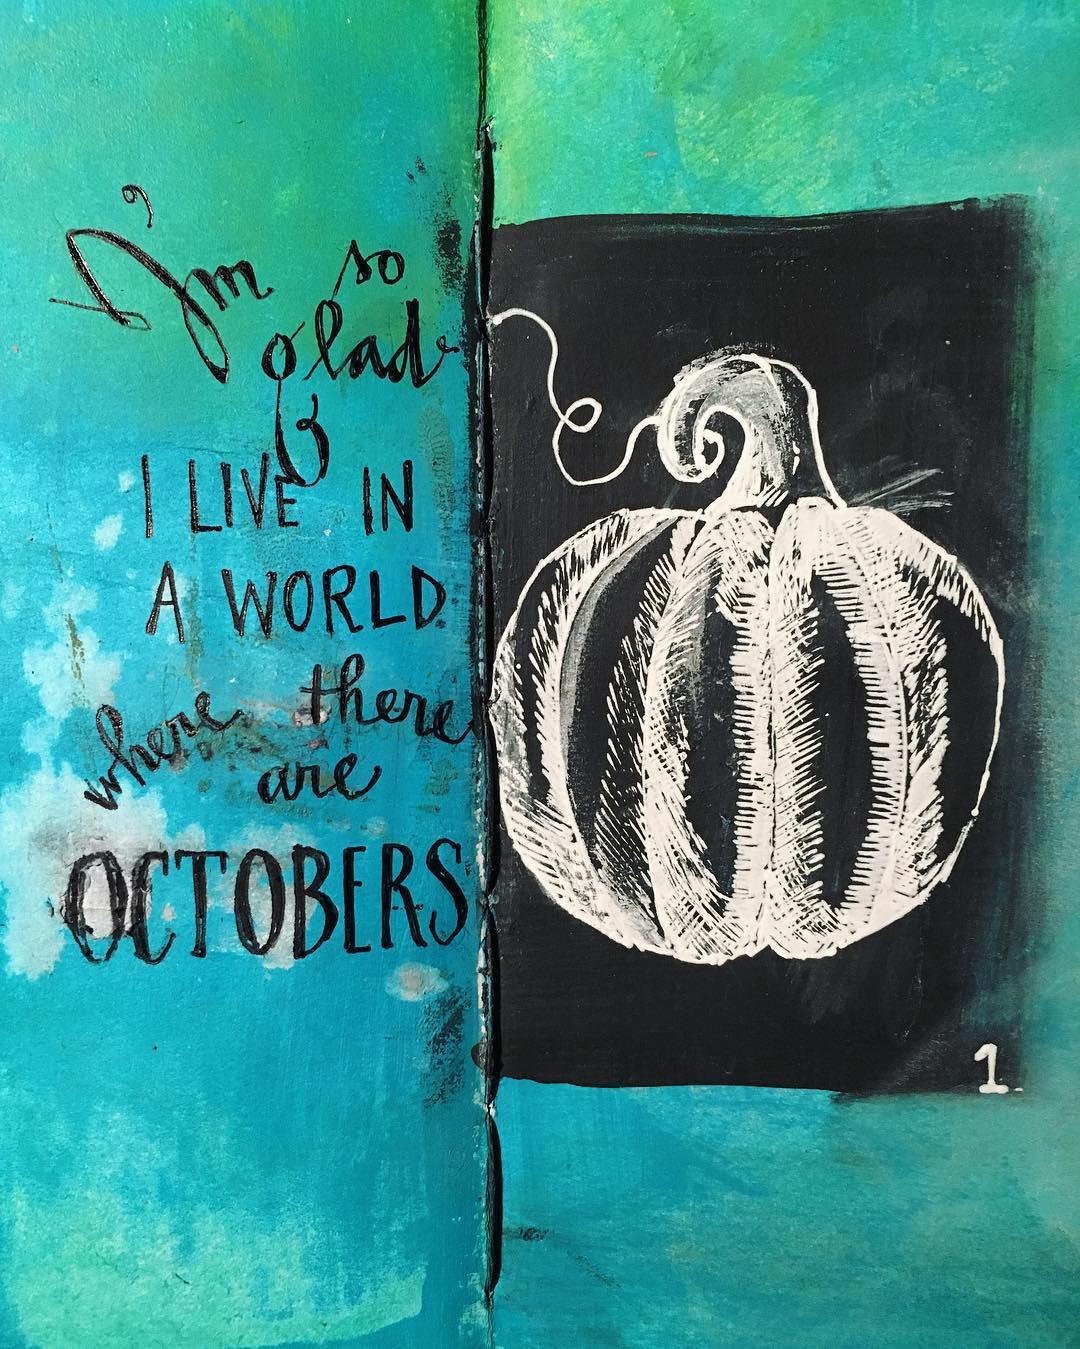 Saturday 1 October 2016 I forgot that I sealed mosthellip